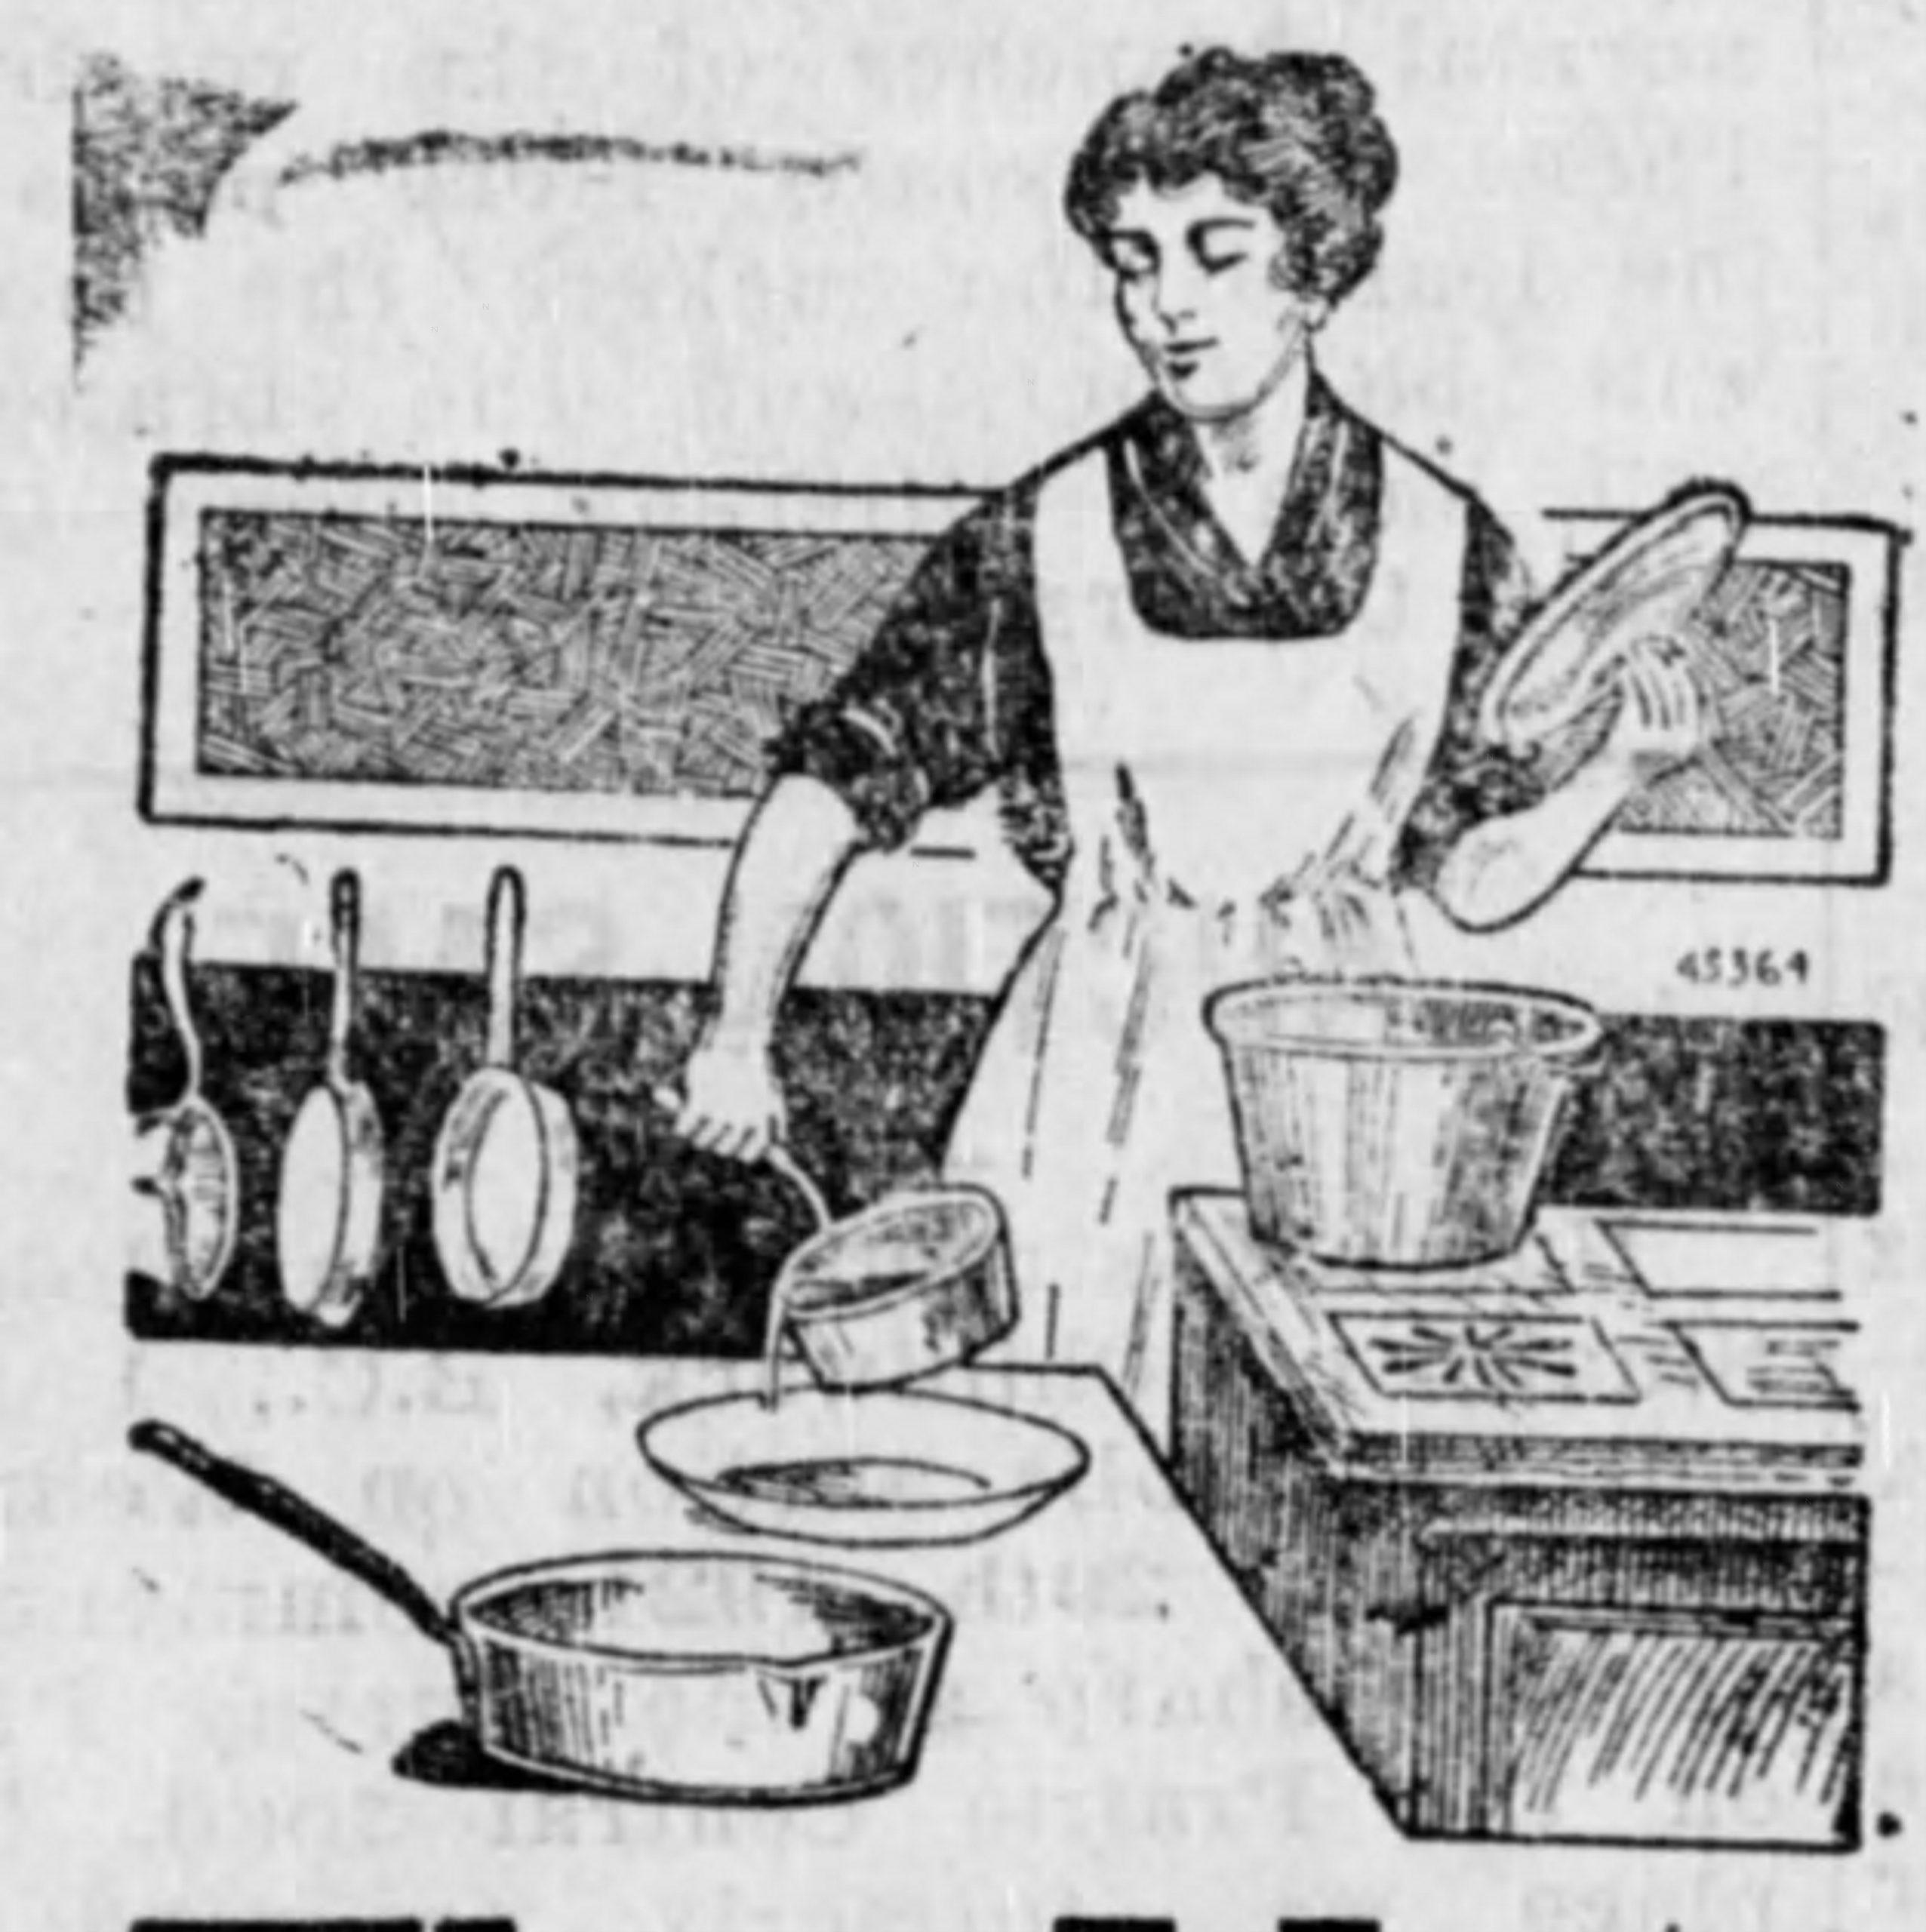 Welsh Rarebit Recipes from 1912